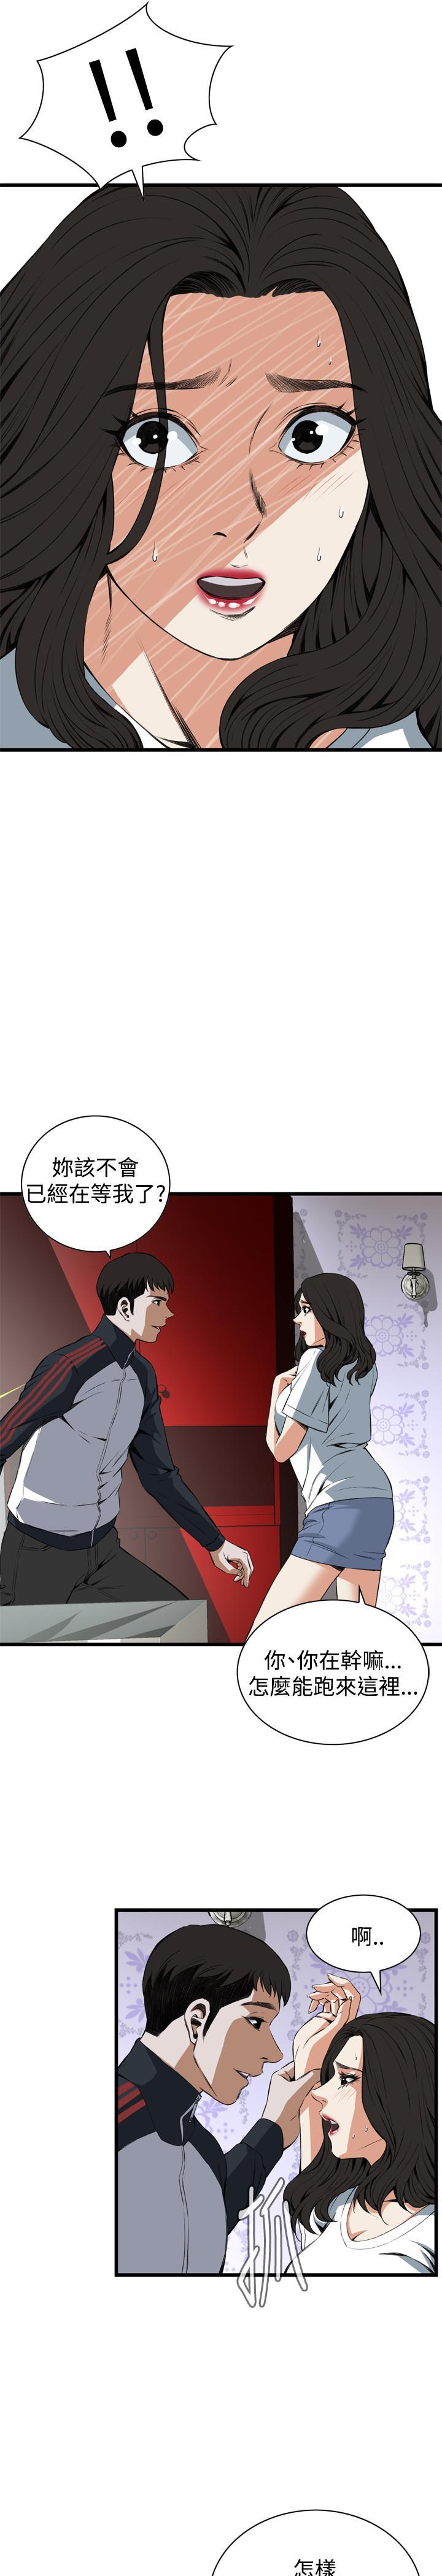 Take a Peek 偷窥 Ch.39~60 [Chinese]中文 661